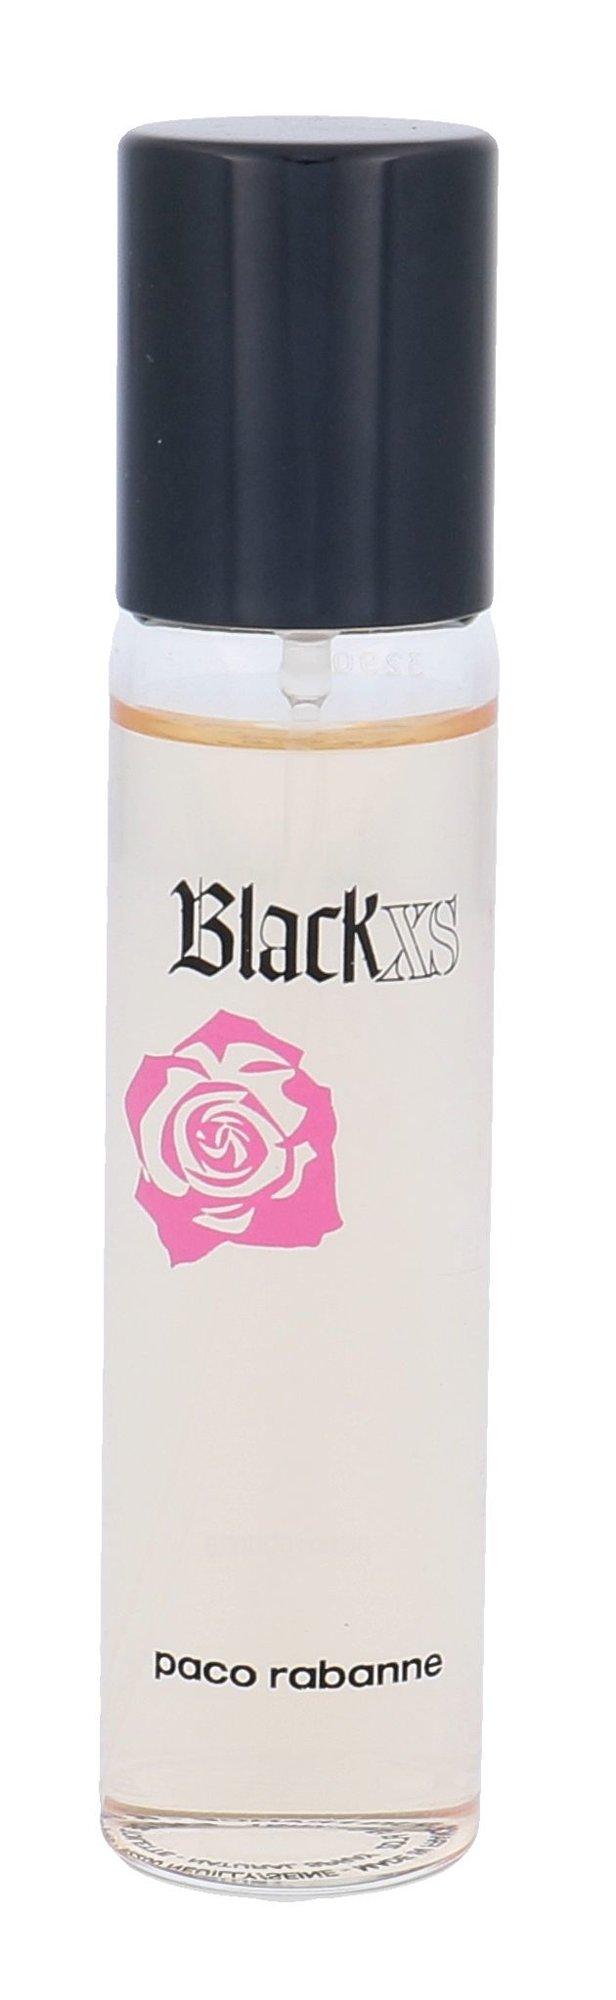 Paco Rabanne Black XS EDT 15ml